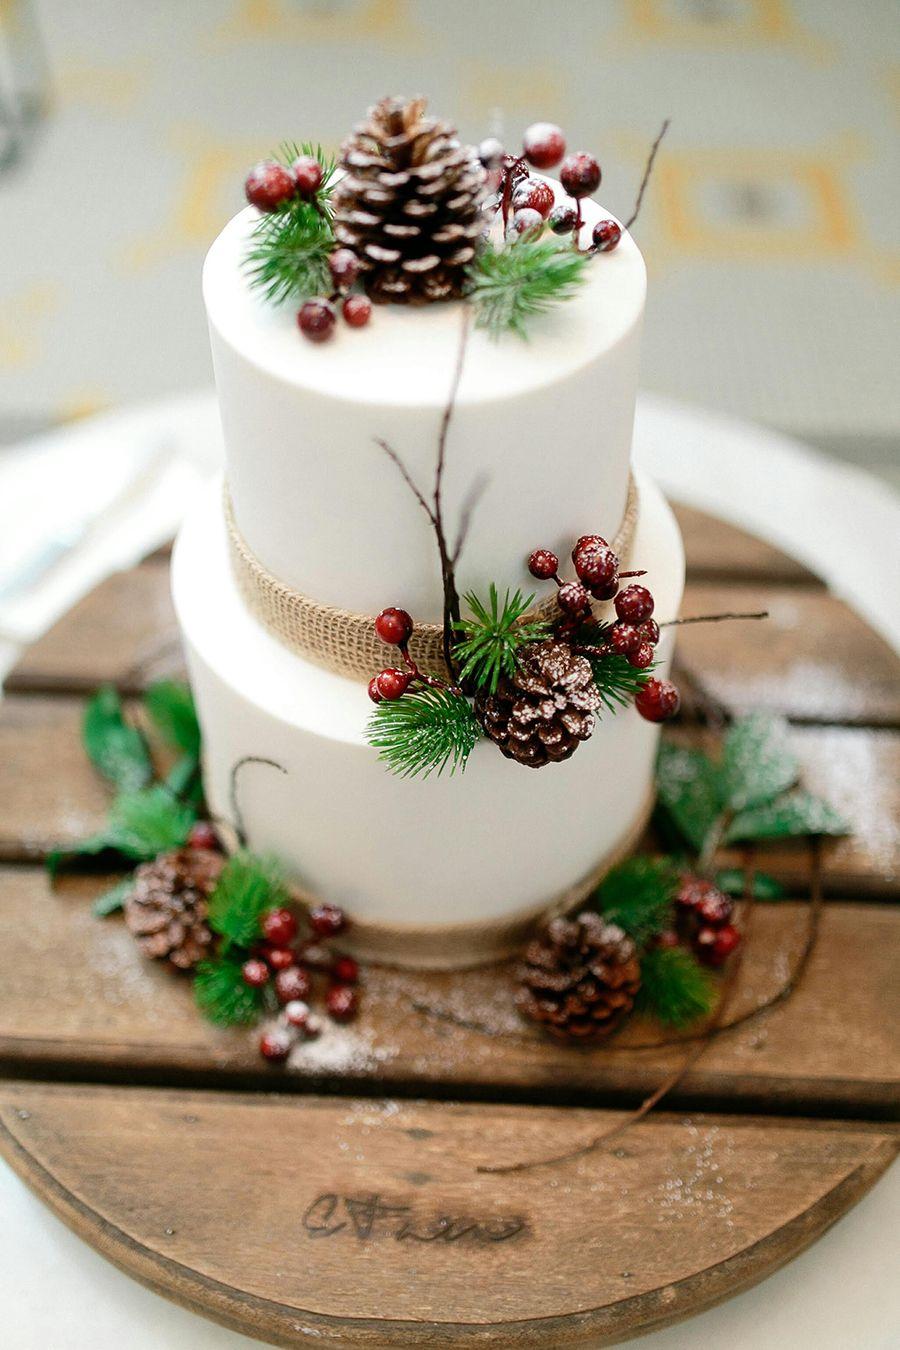 Cake Design In Kl : Top 10 Wedding Cake Creators in Malaysia - Part 2 Bryllup